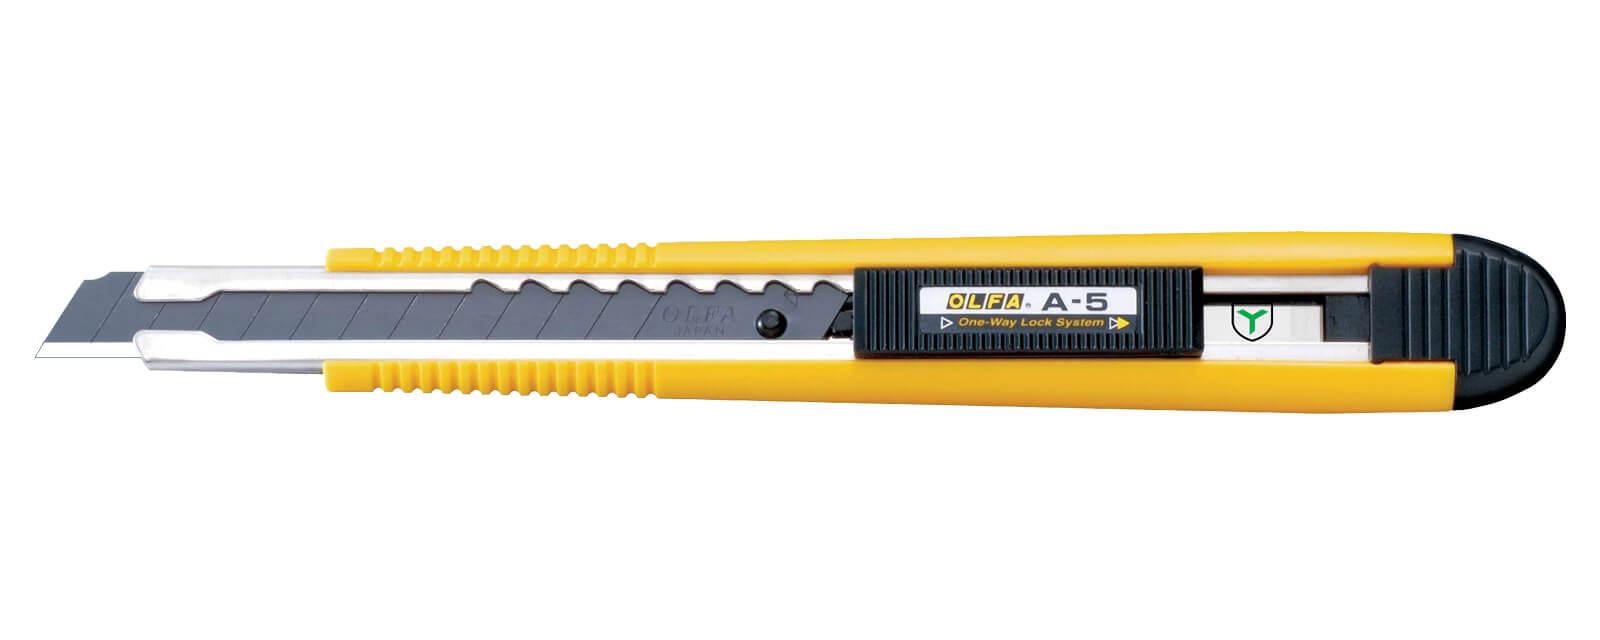 C071-Cuttermesser-9mm-Olfa-A5-CURT-tools_1600